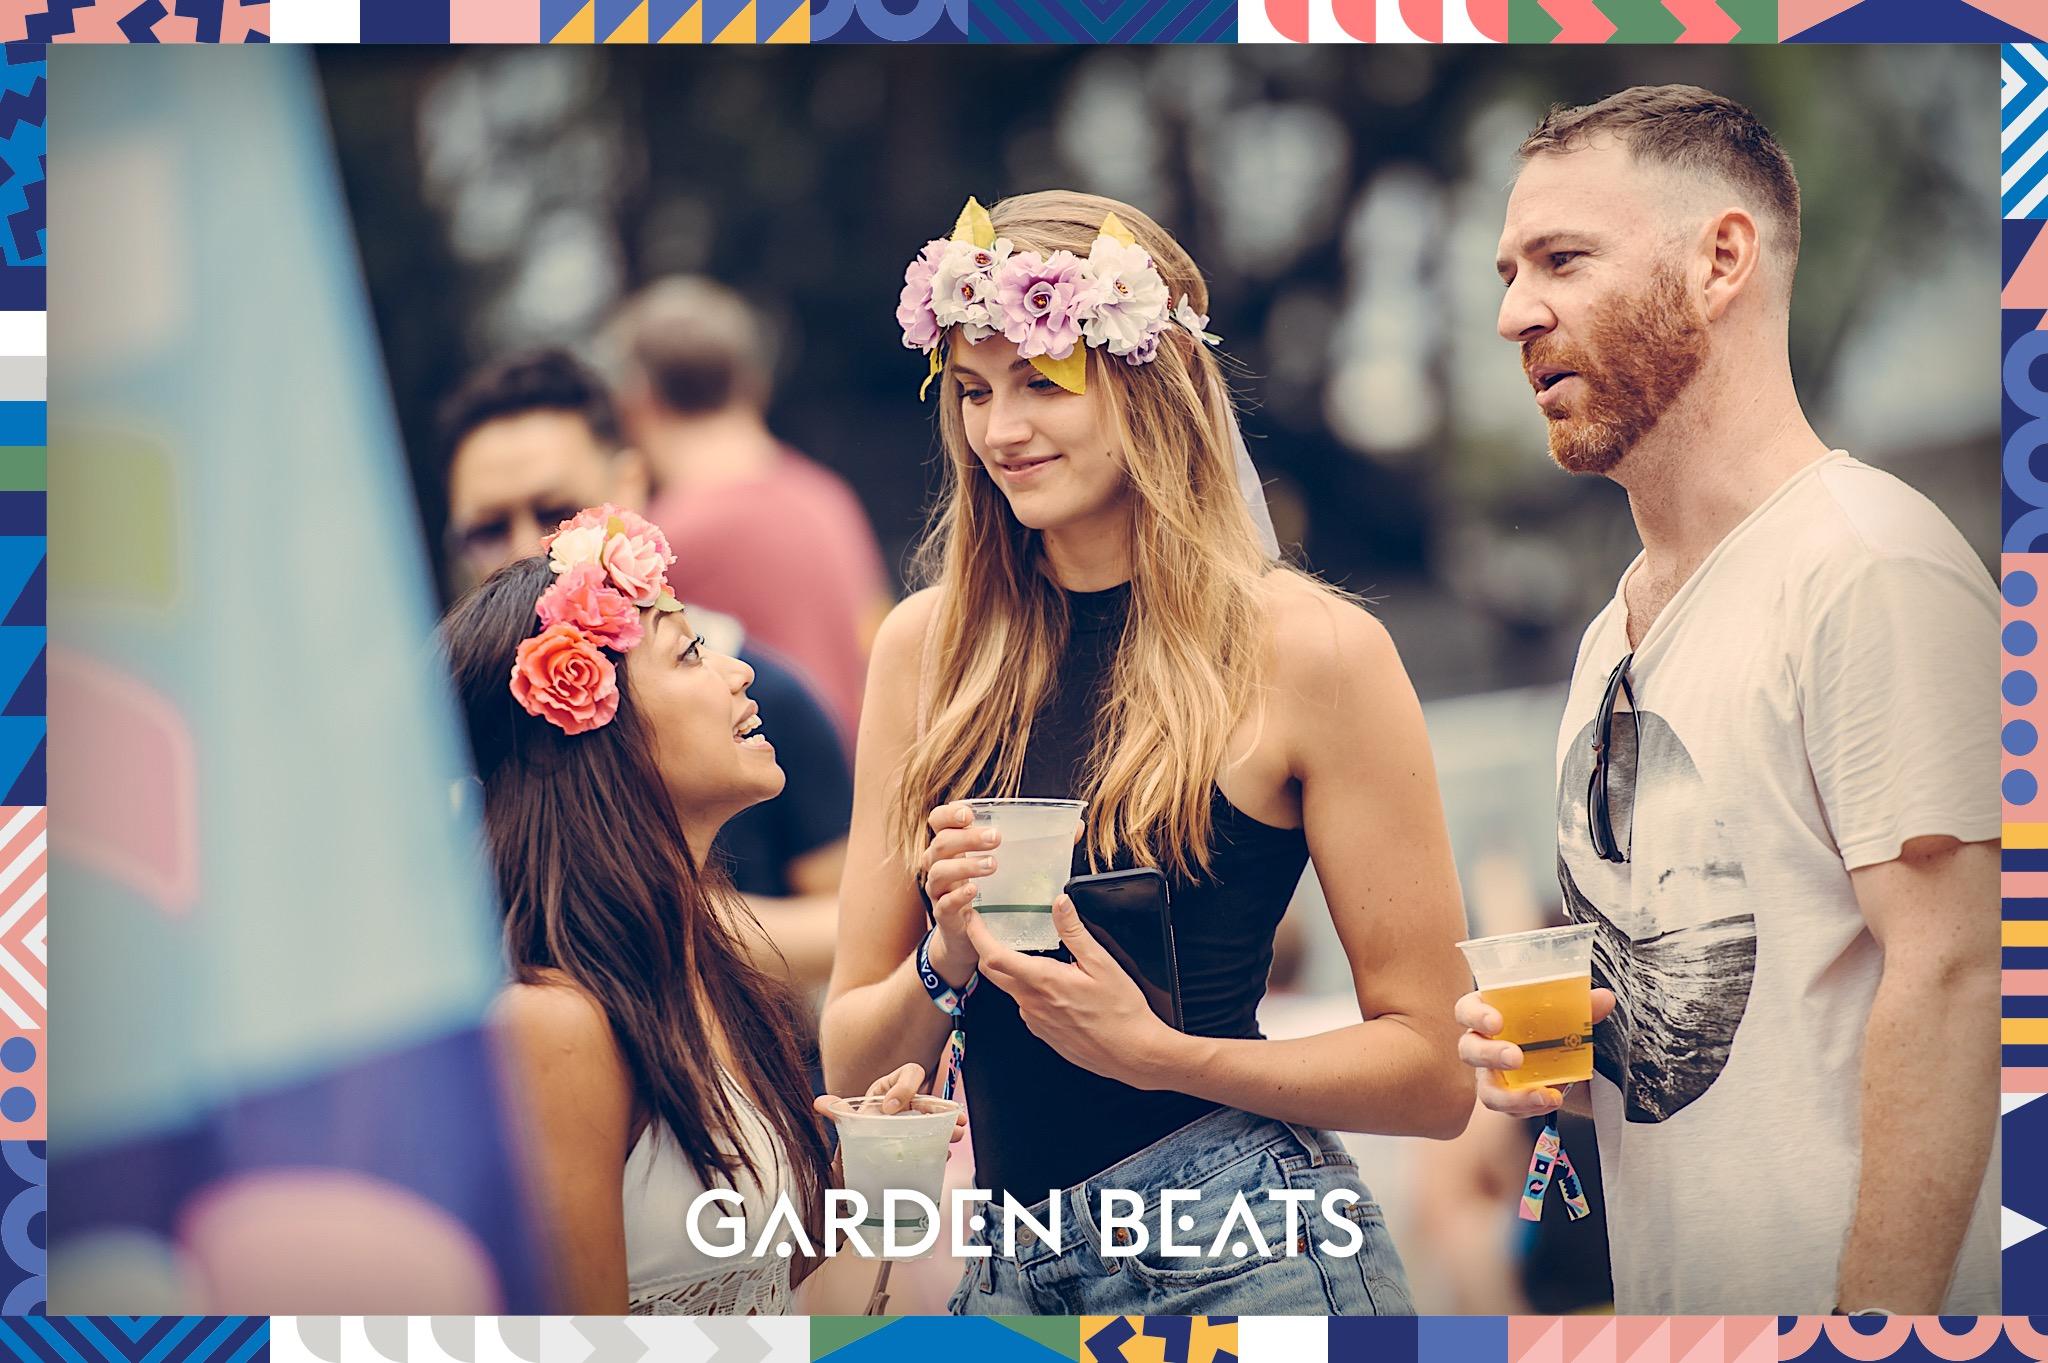 03032018_GardenBeats_Colossal506_Watermarked.jpg